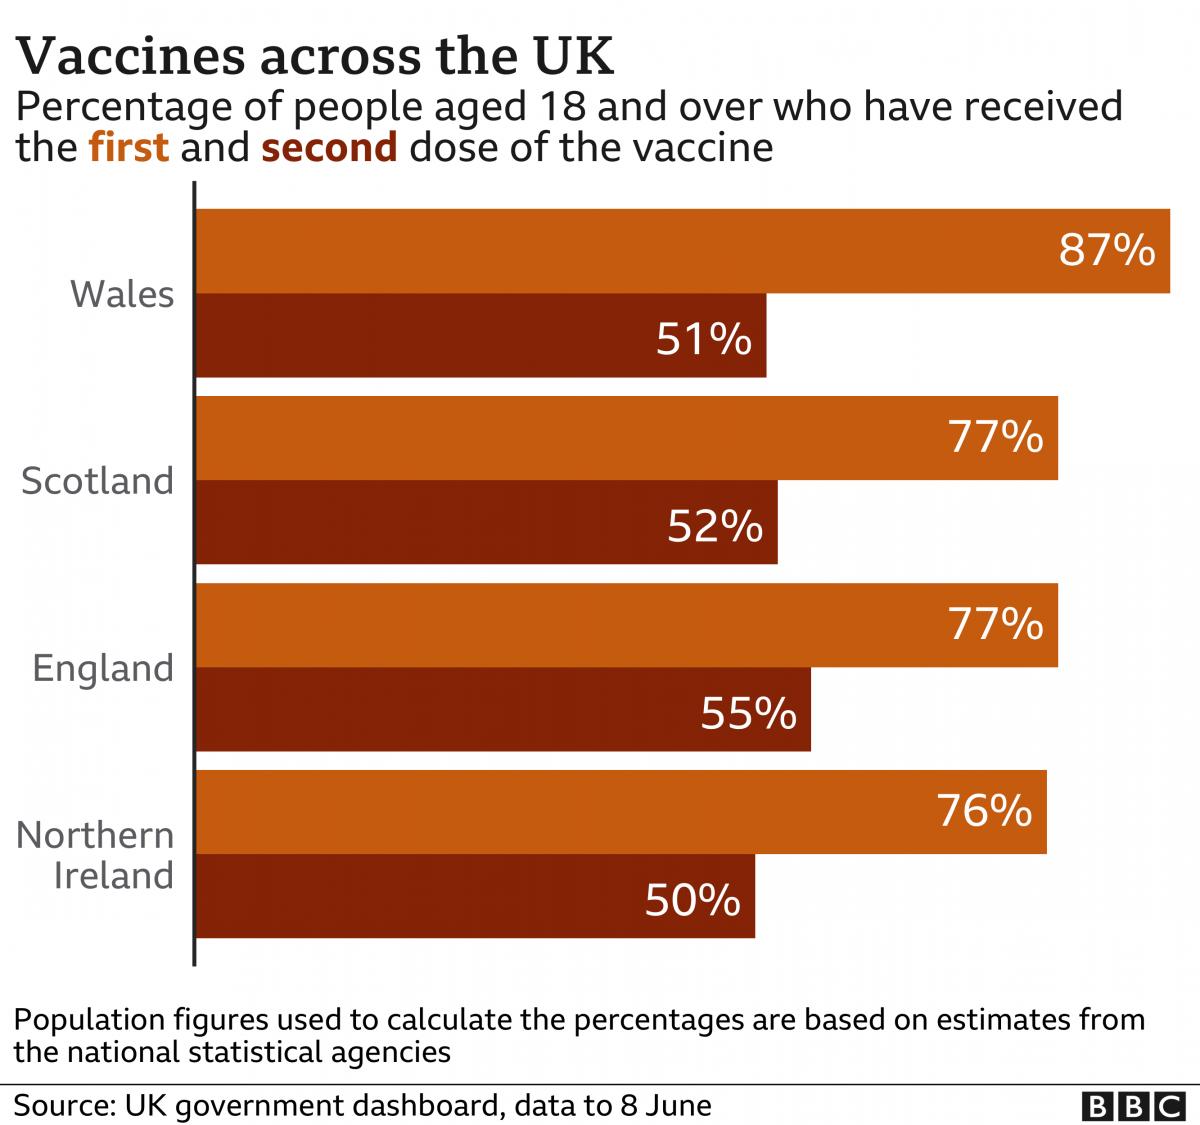 Vaccines across the UK